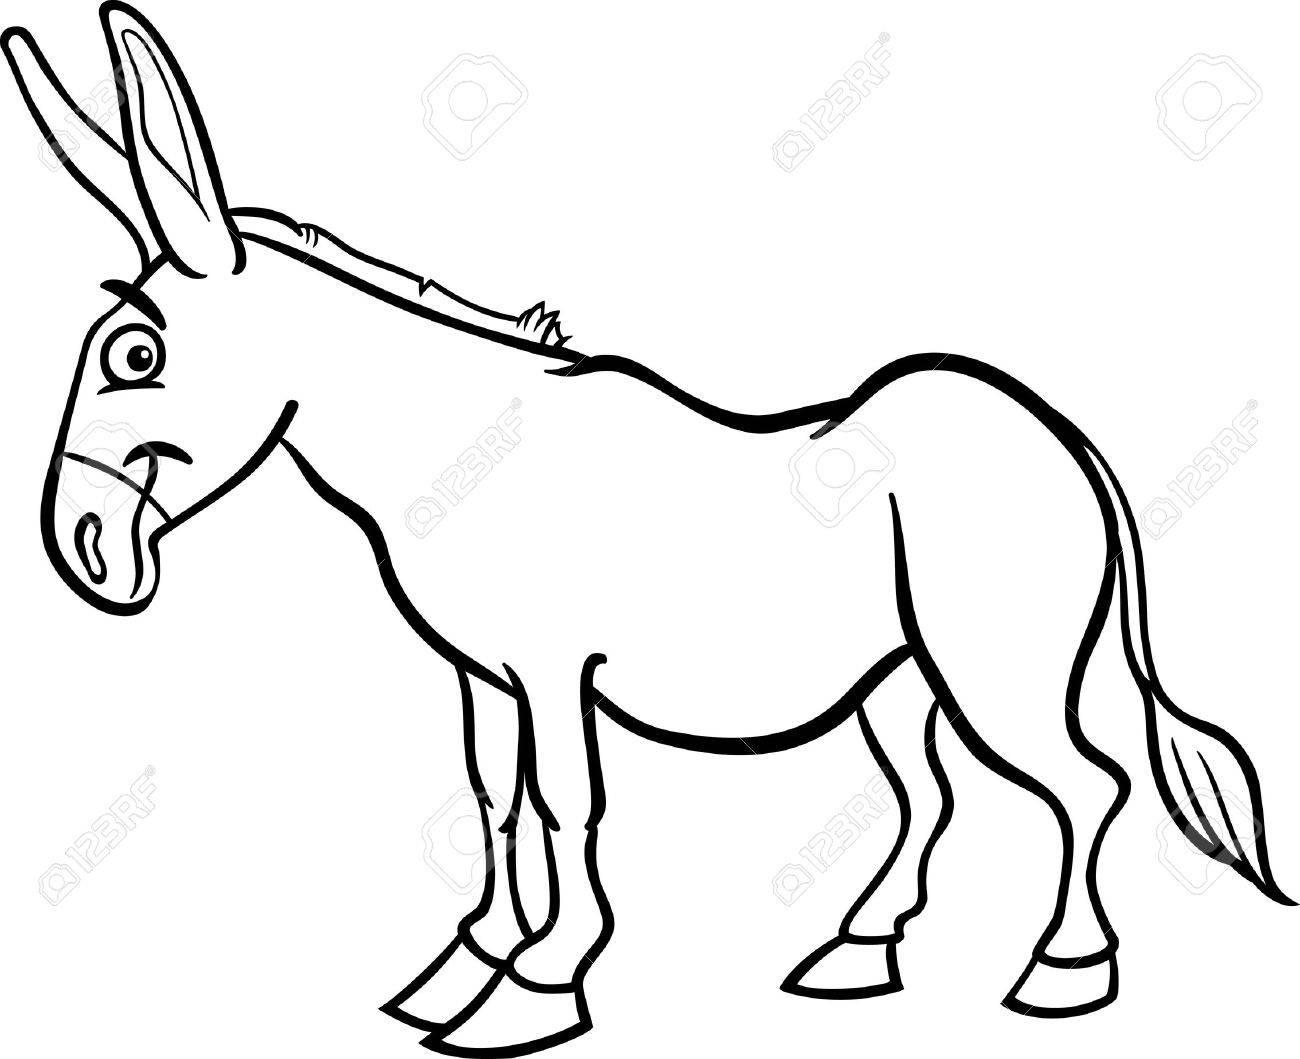 Black and White Cartoon Illustration of Funny Donkey Farm Animal...